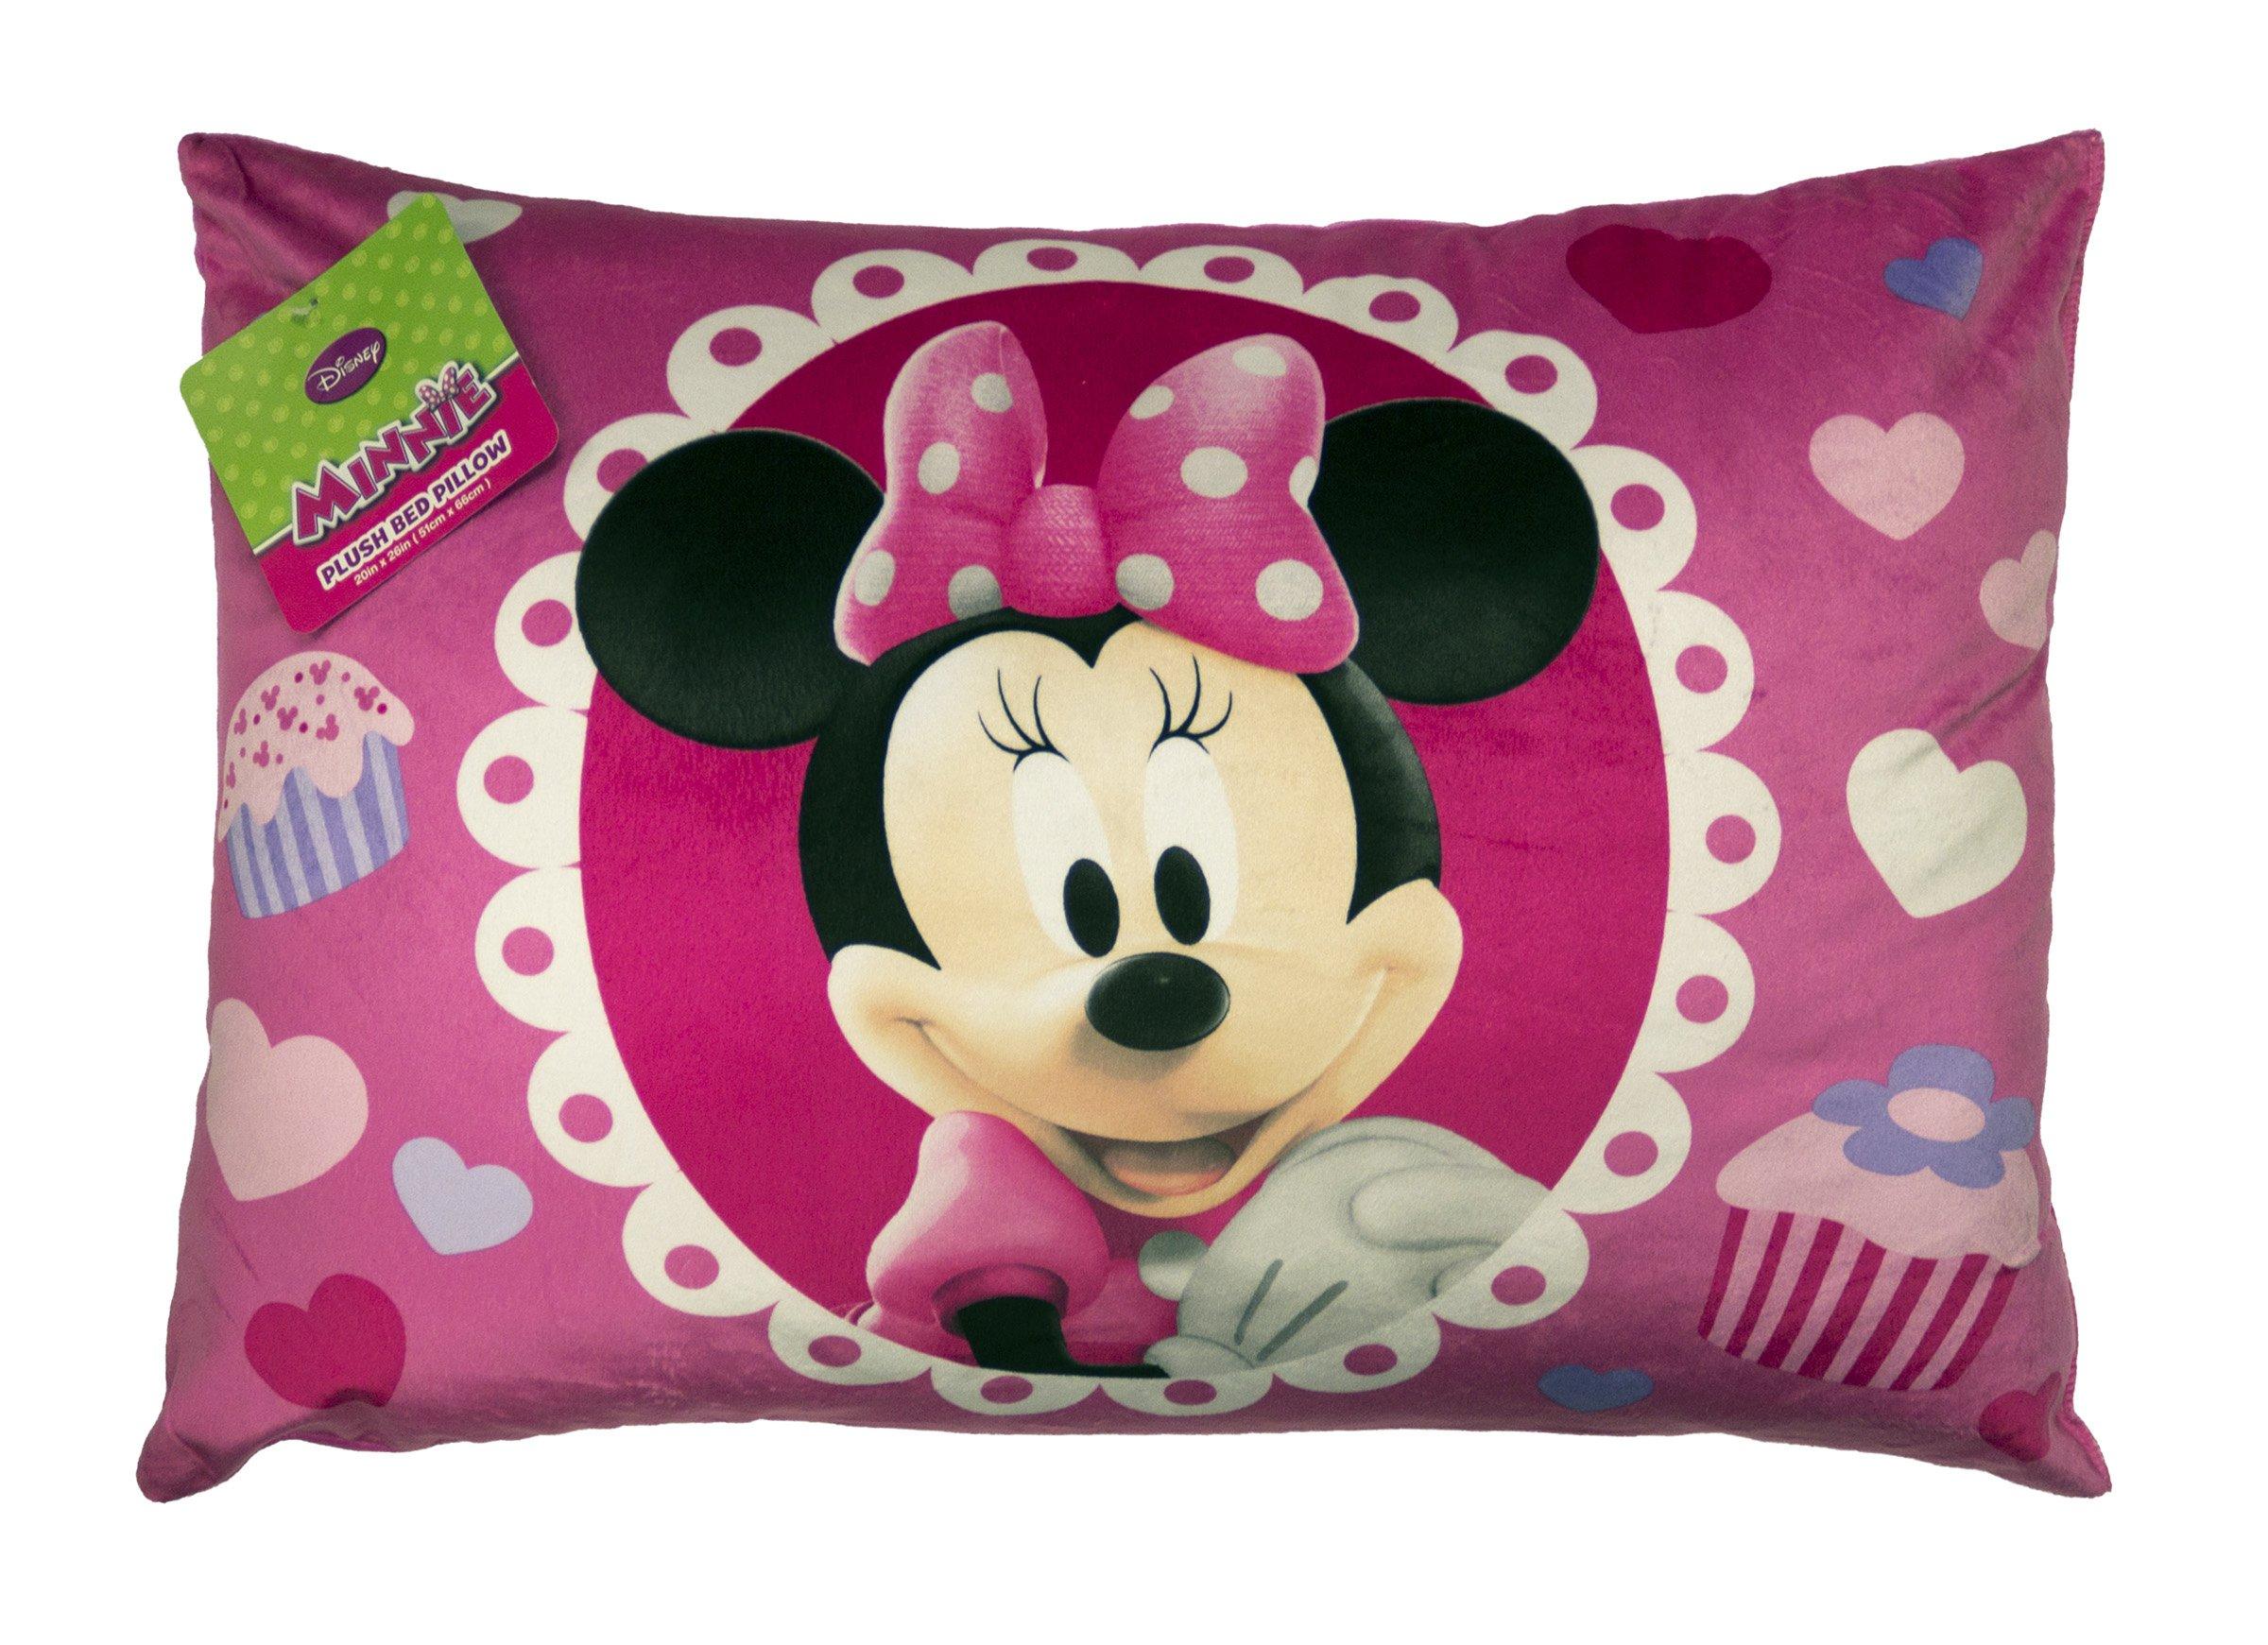 Disney Minnie Bed Pillow by Disney